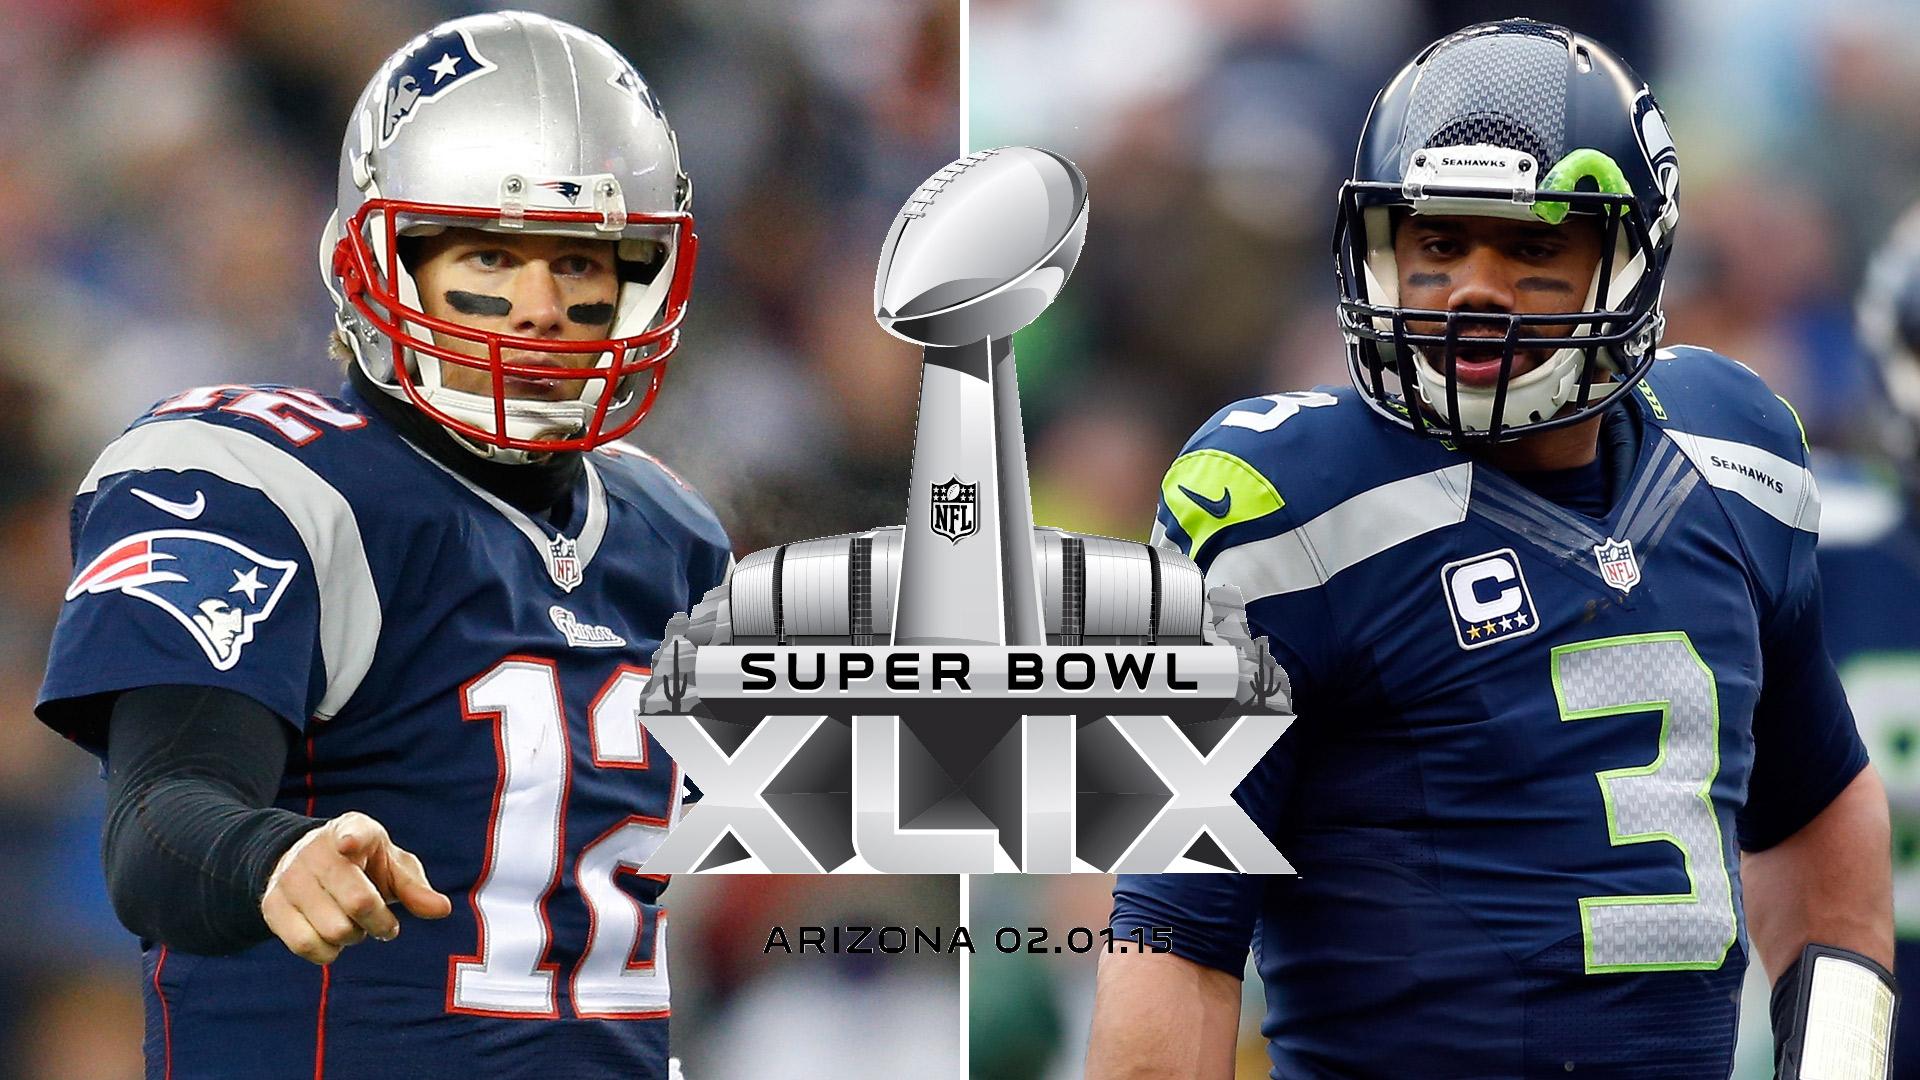 Tom Brady vs Russell Wilson Super Bowl 49